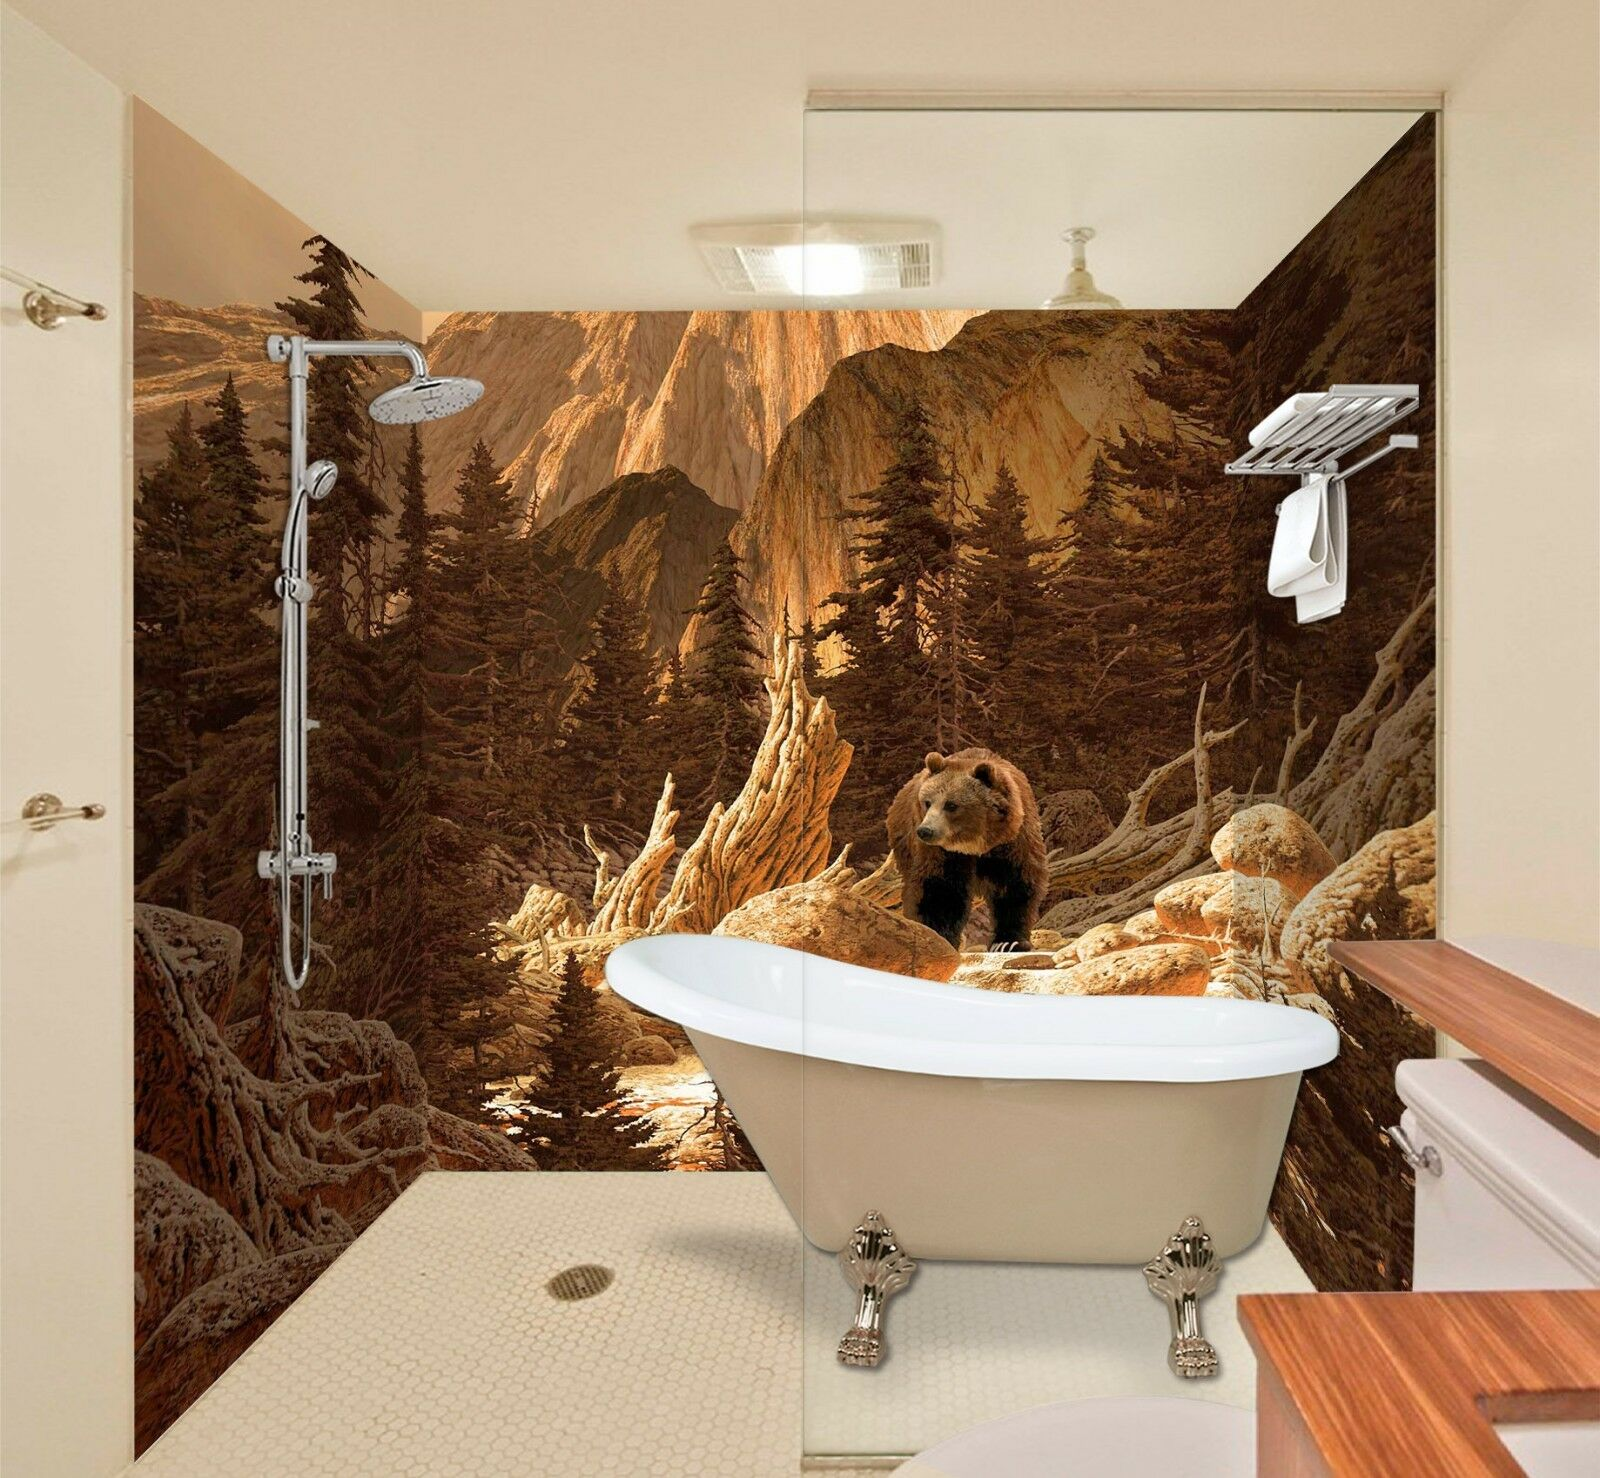 3D Jungle Bear Tree 57 WallPaper Bathroom Print Decal Wall Deco AJ WALL CA Carly